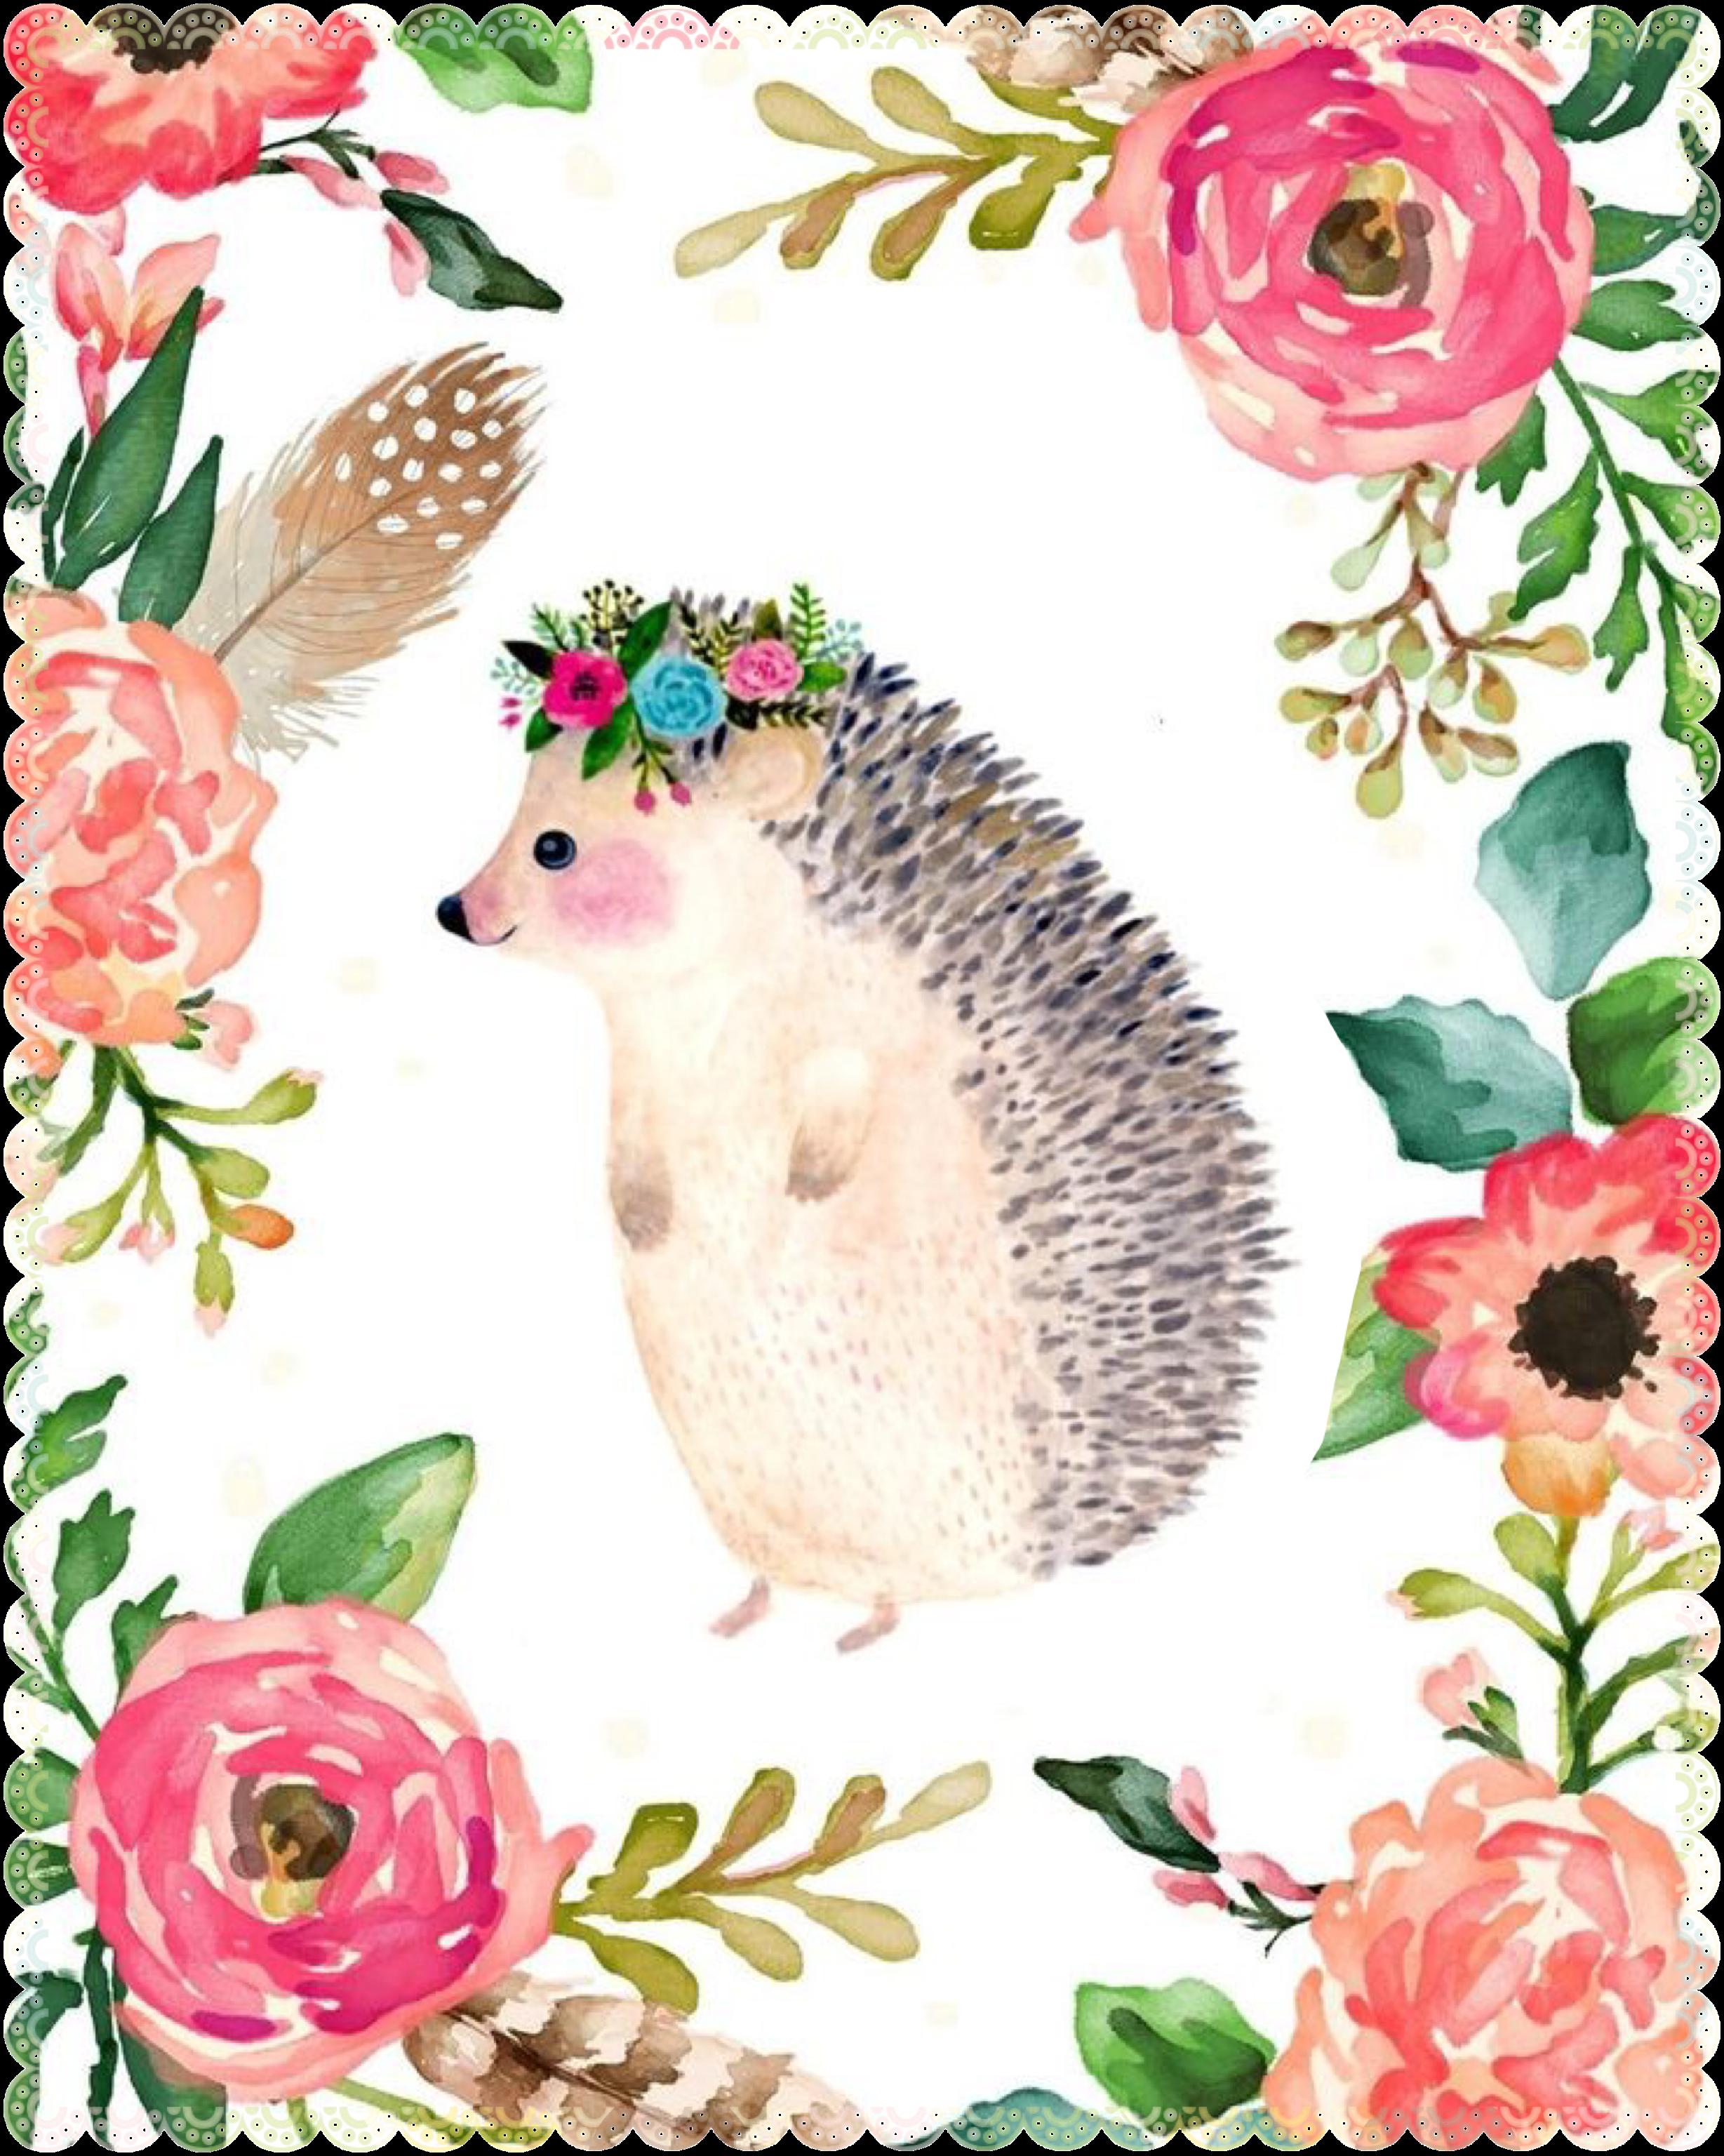 Hedgehog clipart watercolor. Pin by alba rivera